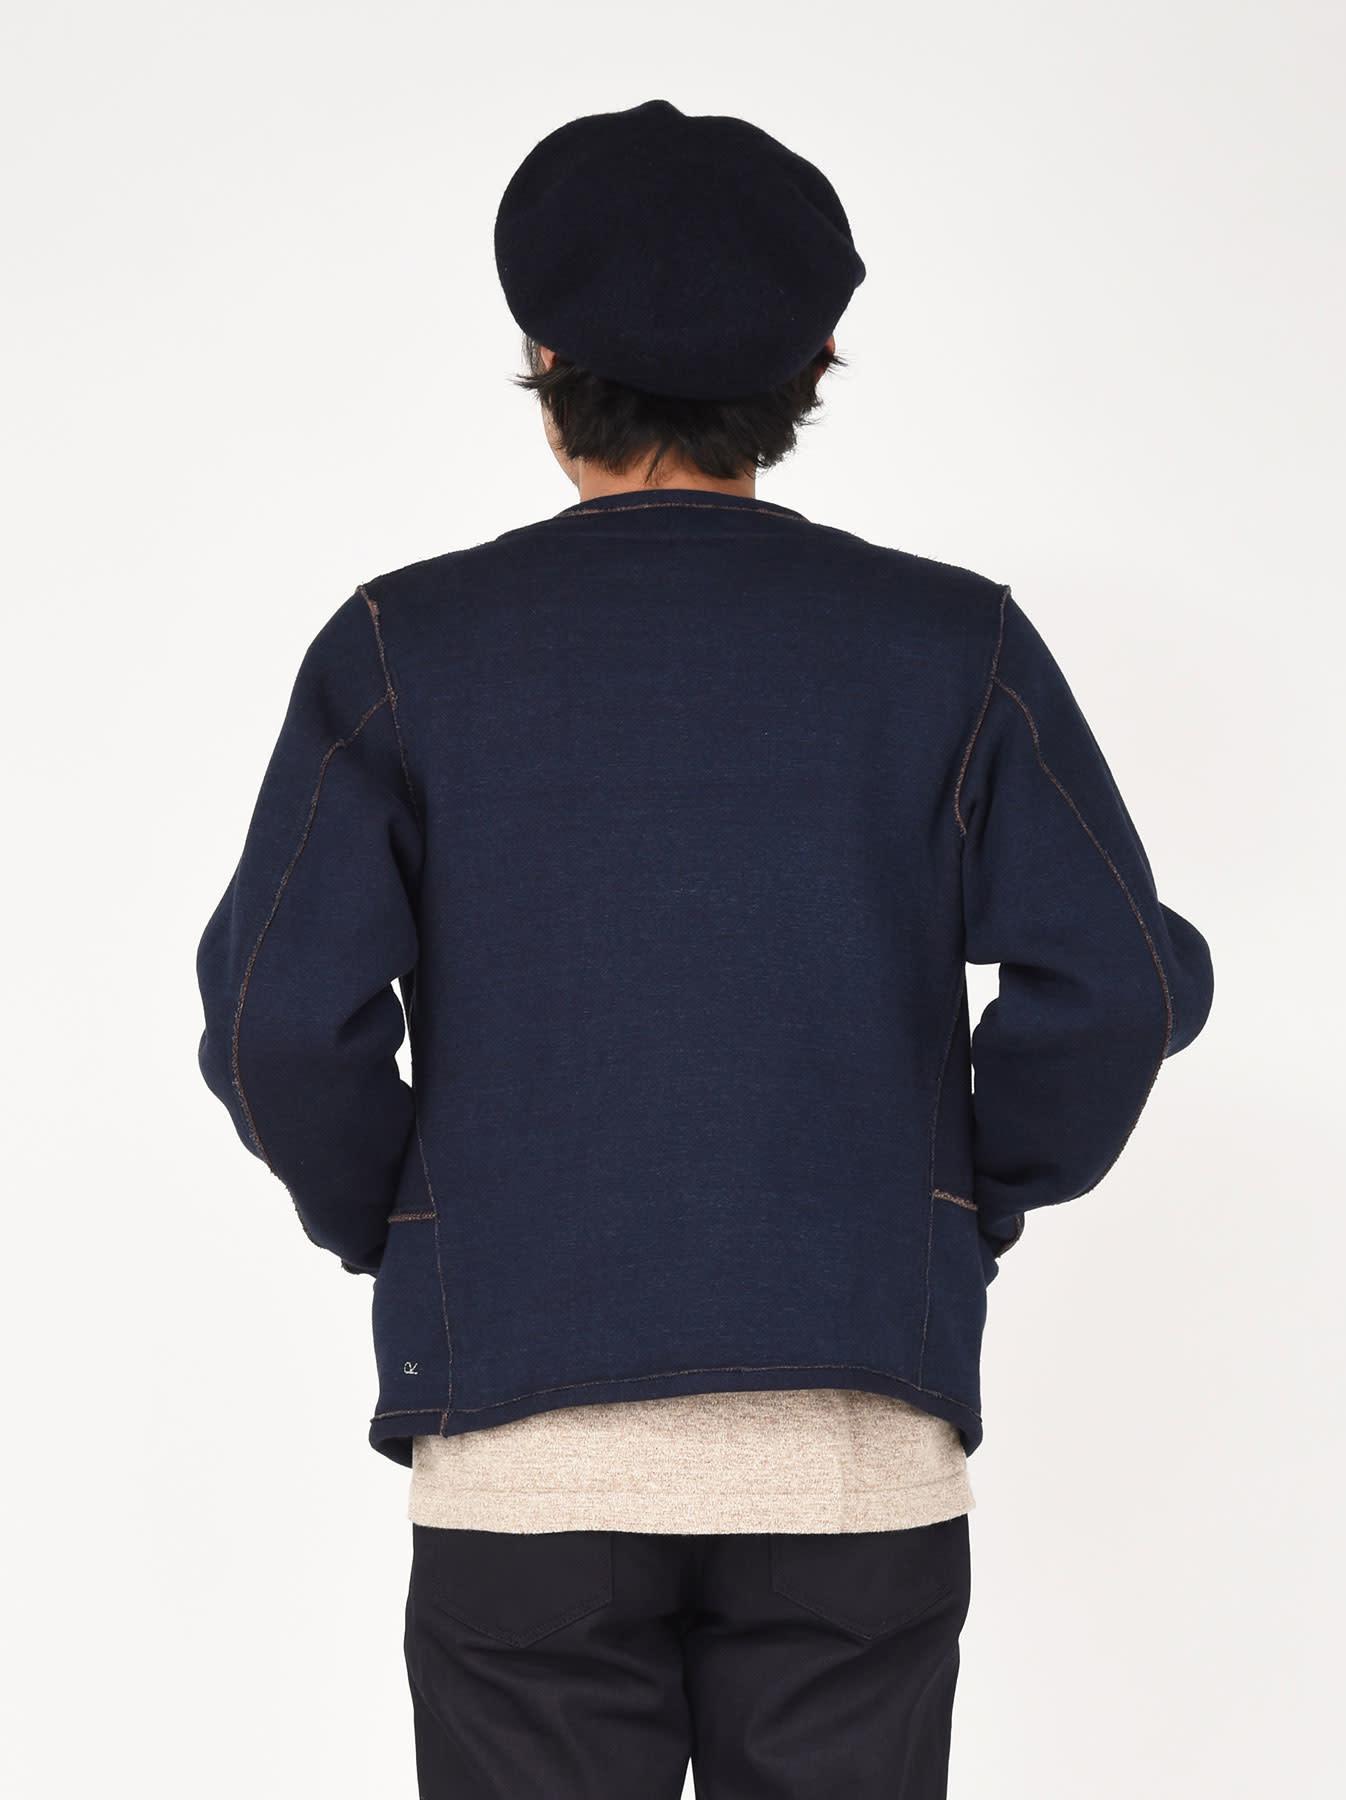 Indigo Hokkaido Fleecy Liner Cardigan-4